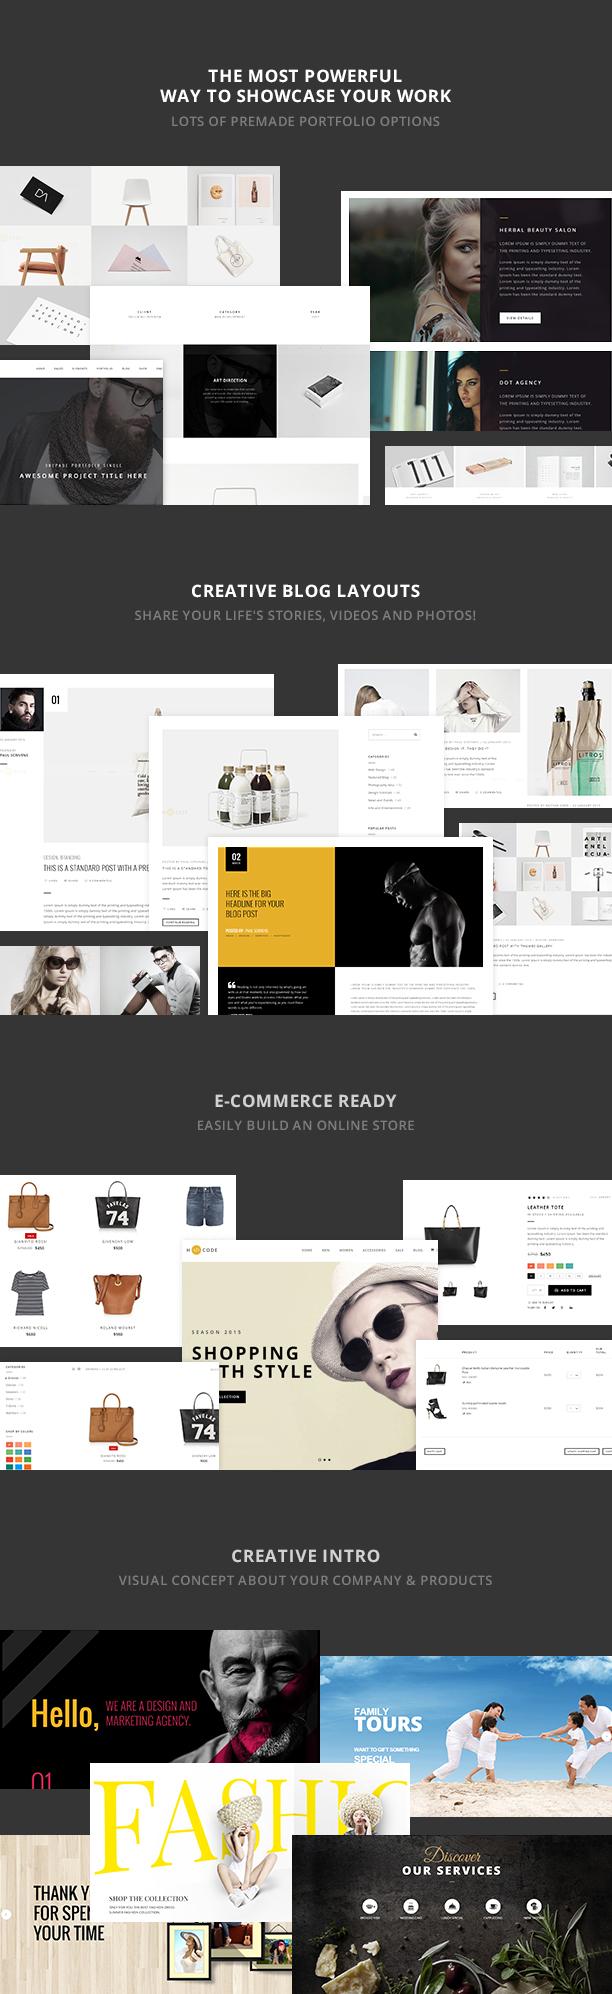 presentation6 - H-Code Multipurpose OnePage & Multi Page Template